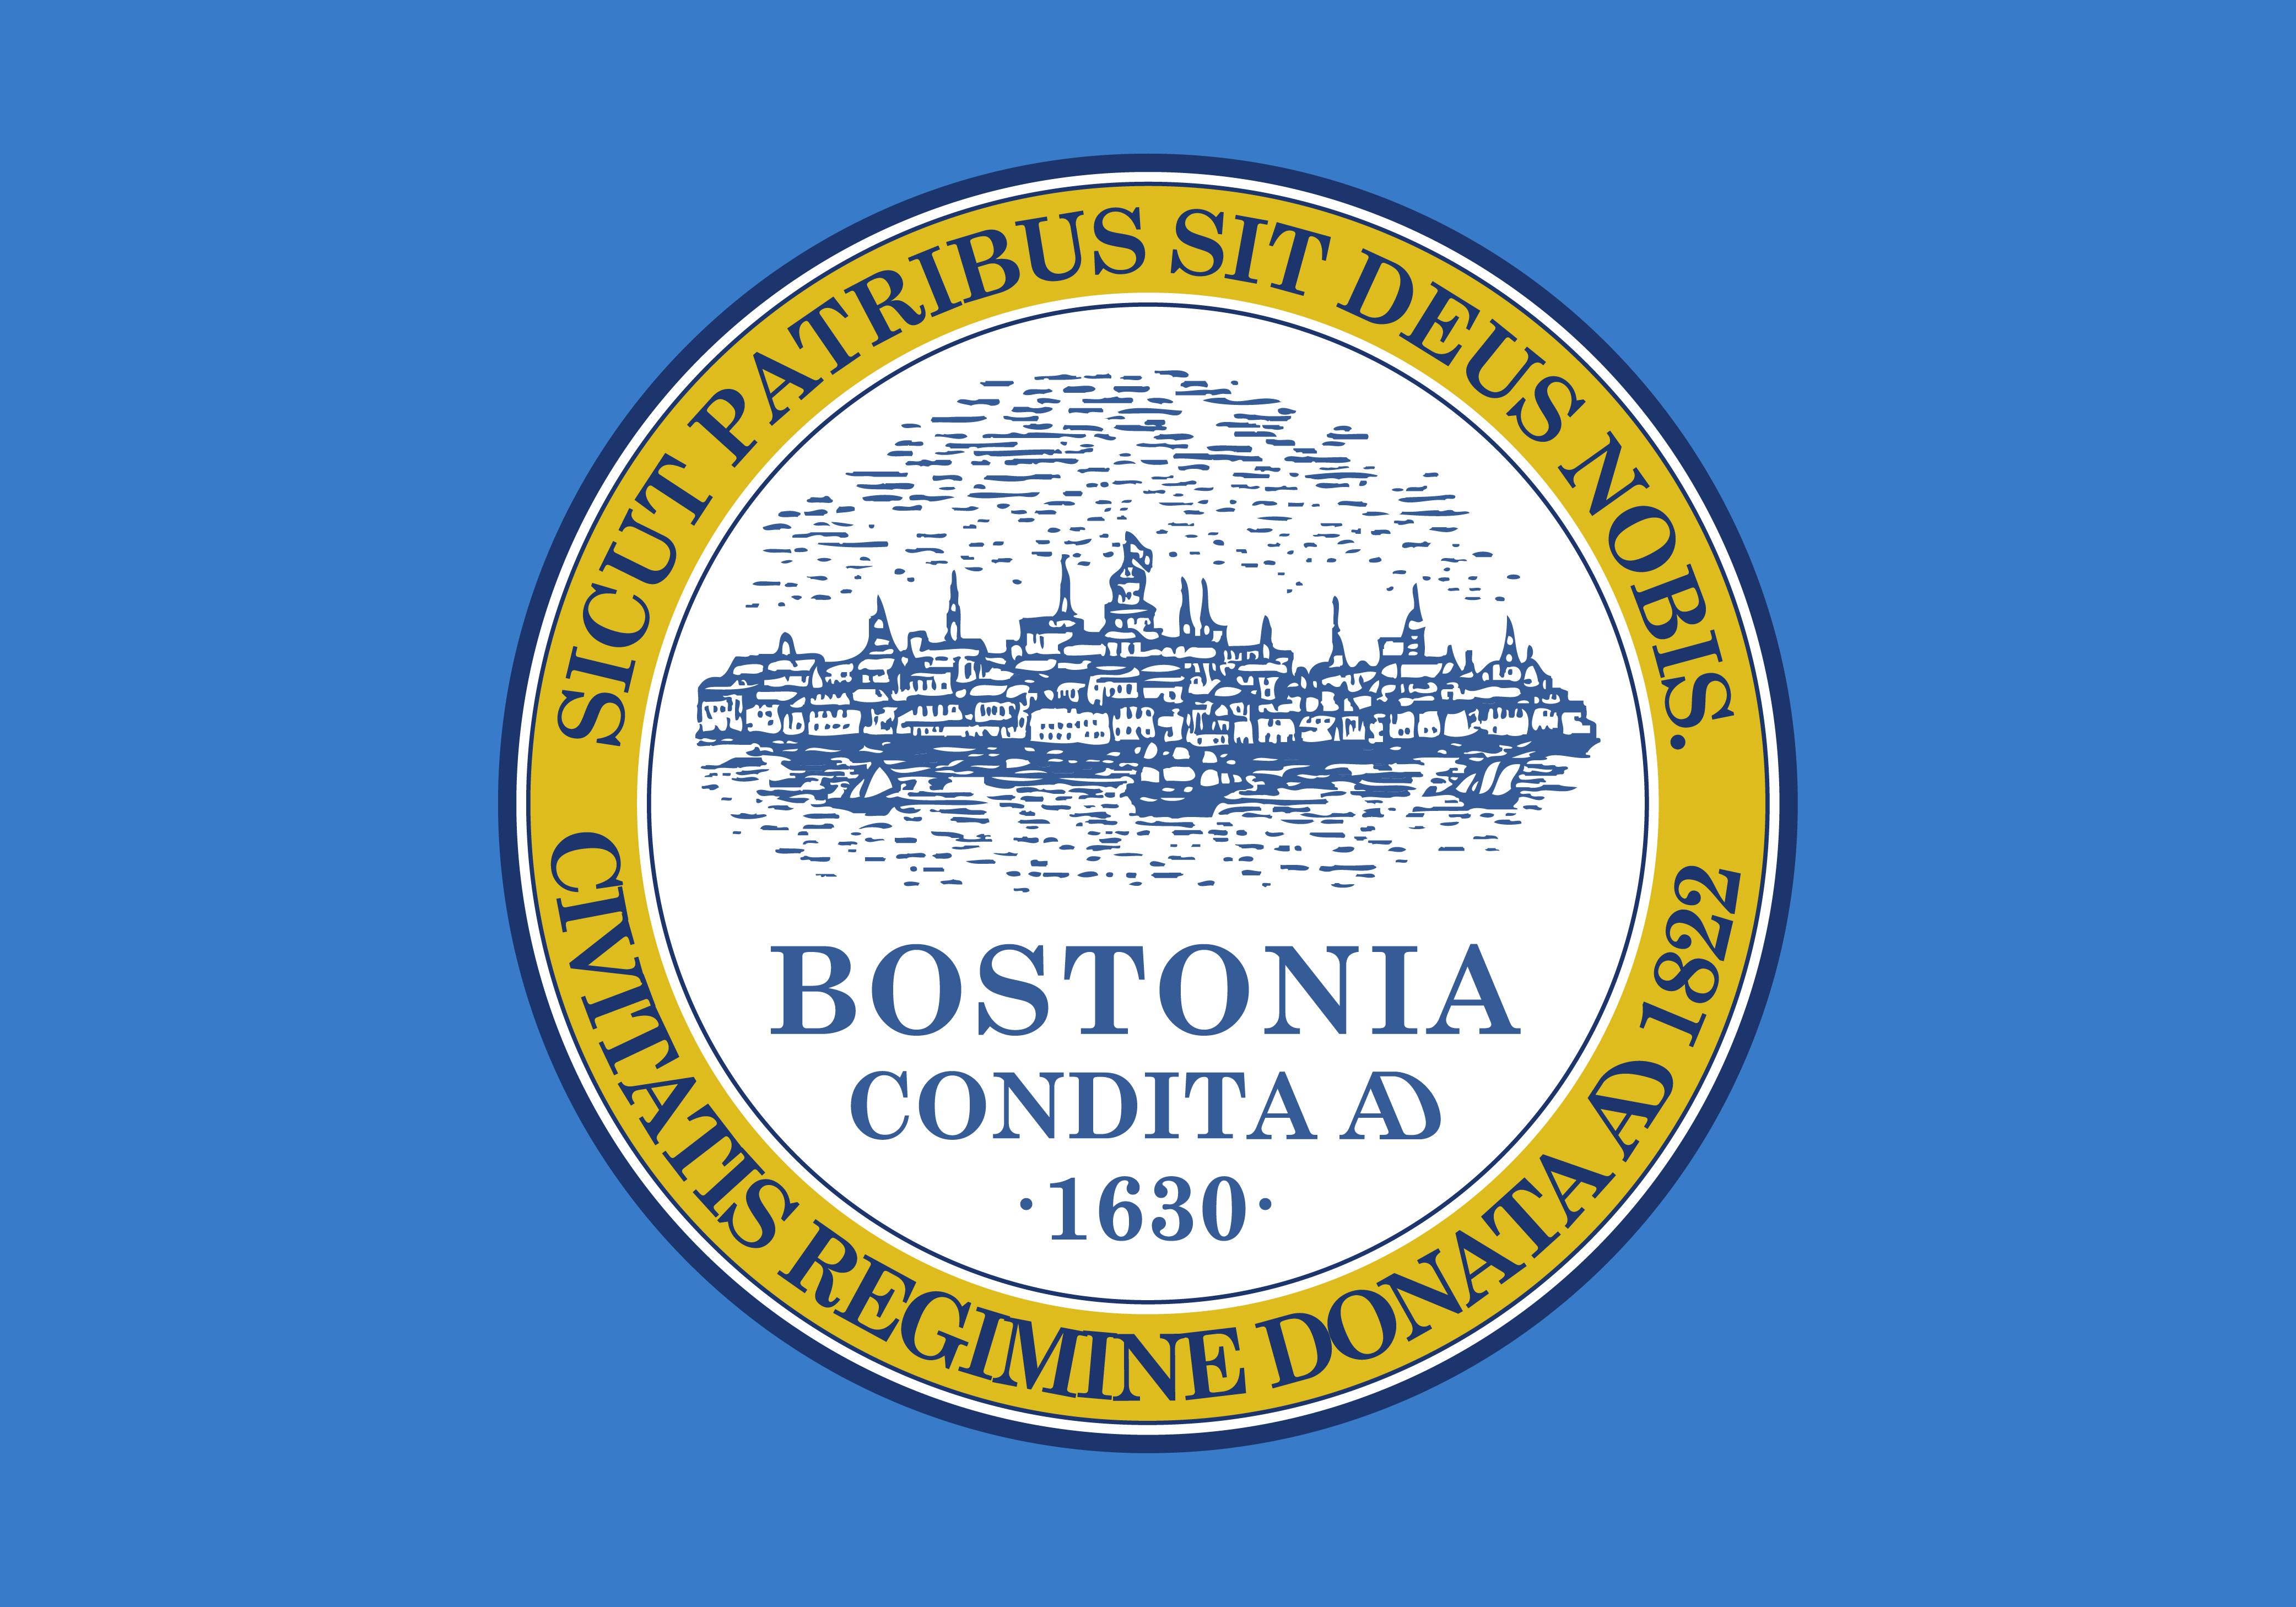 Boston City Flag, by Svgalbertian [Public domain], via Wikimedia Commons